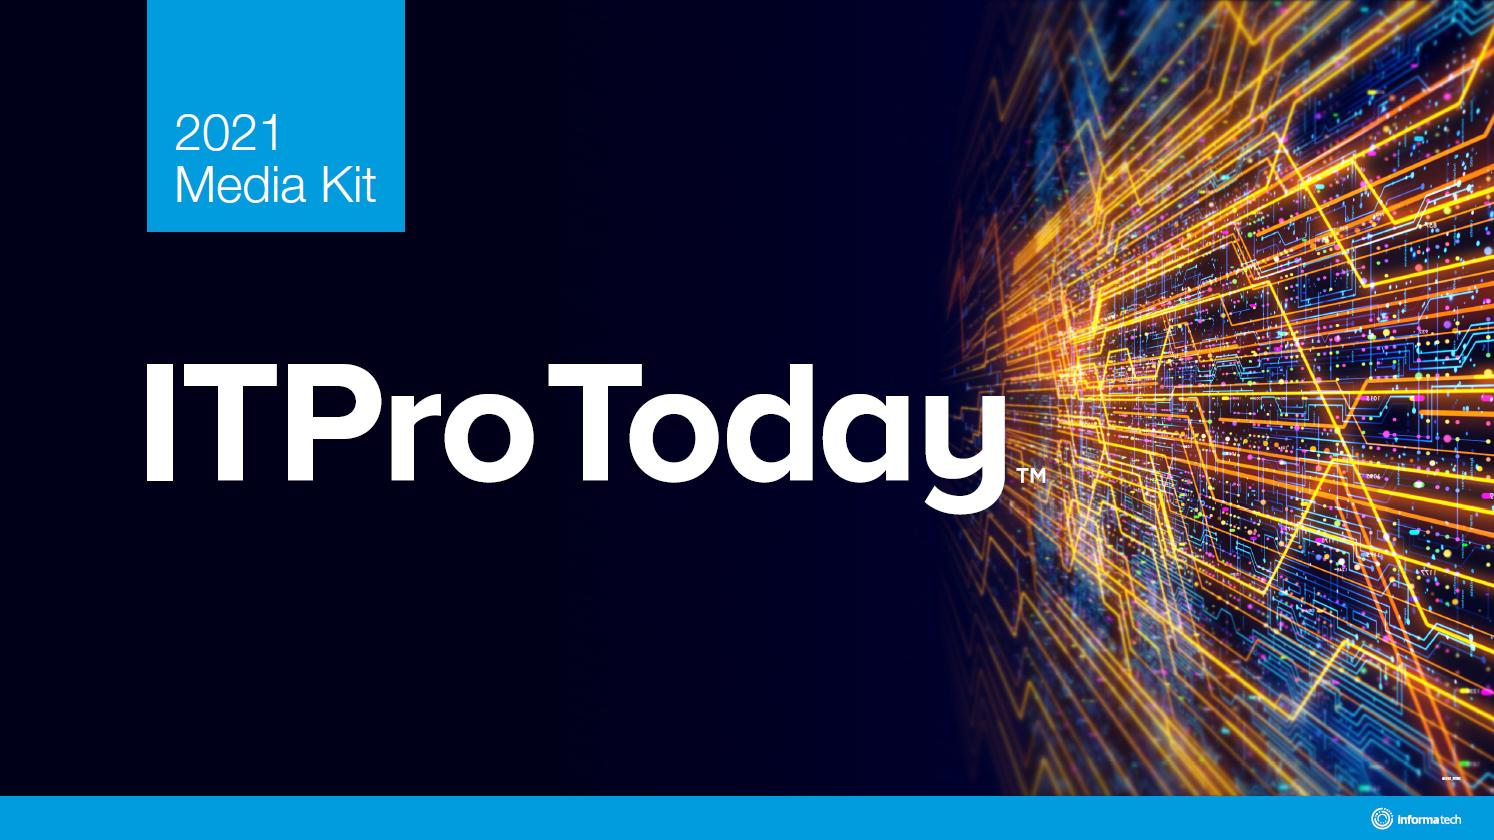 ITPro Today 2021 Media Kit